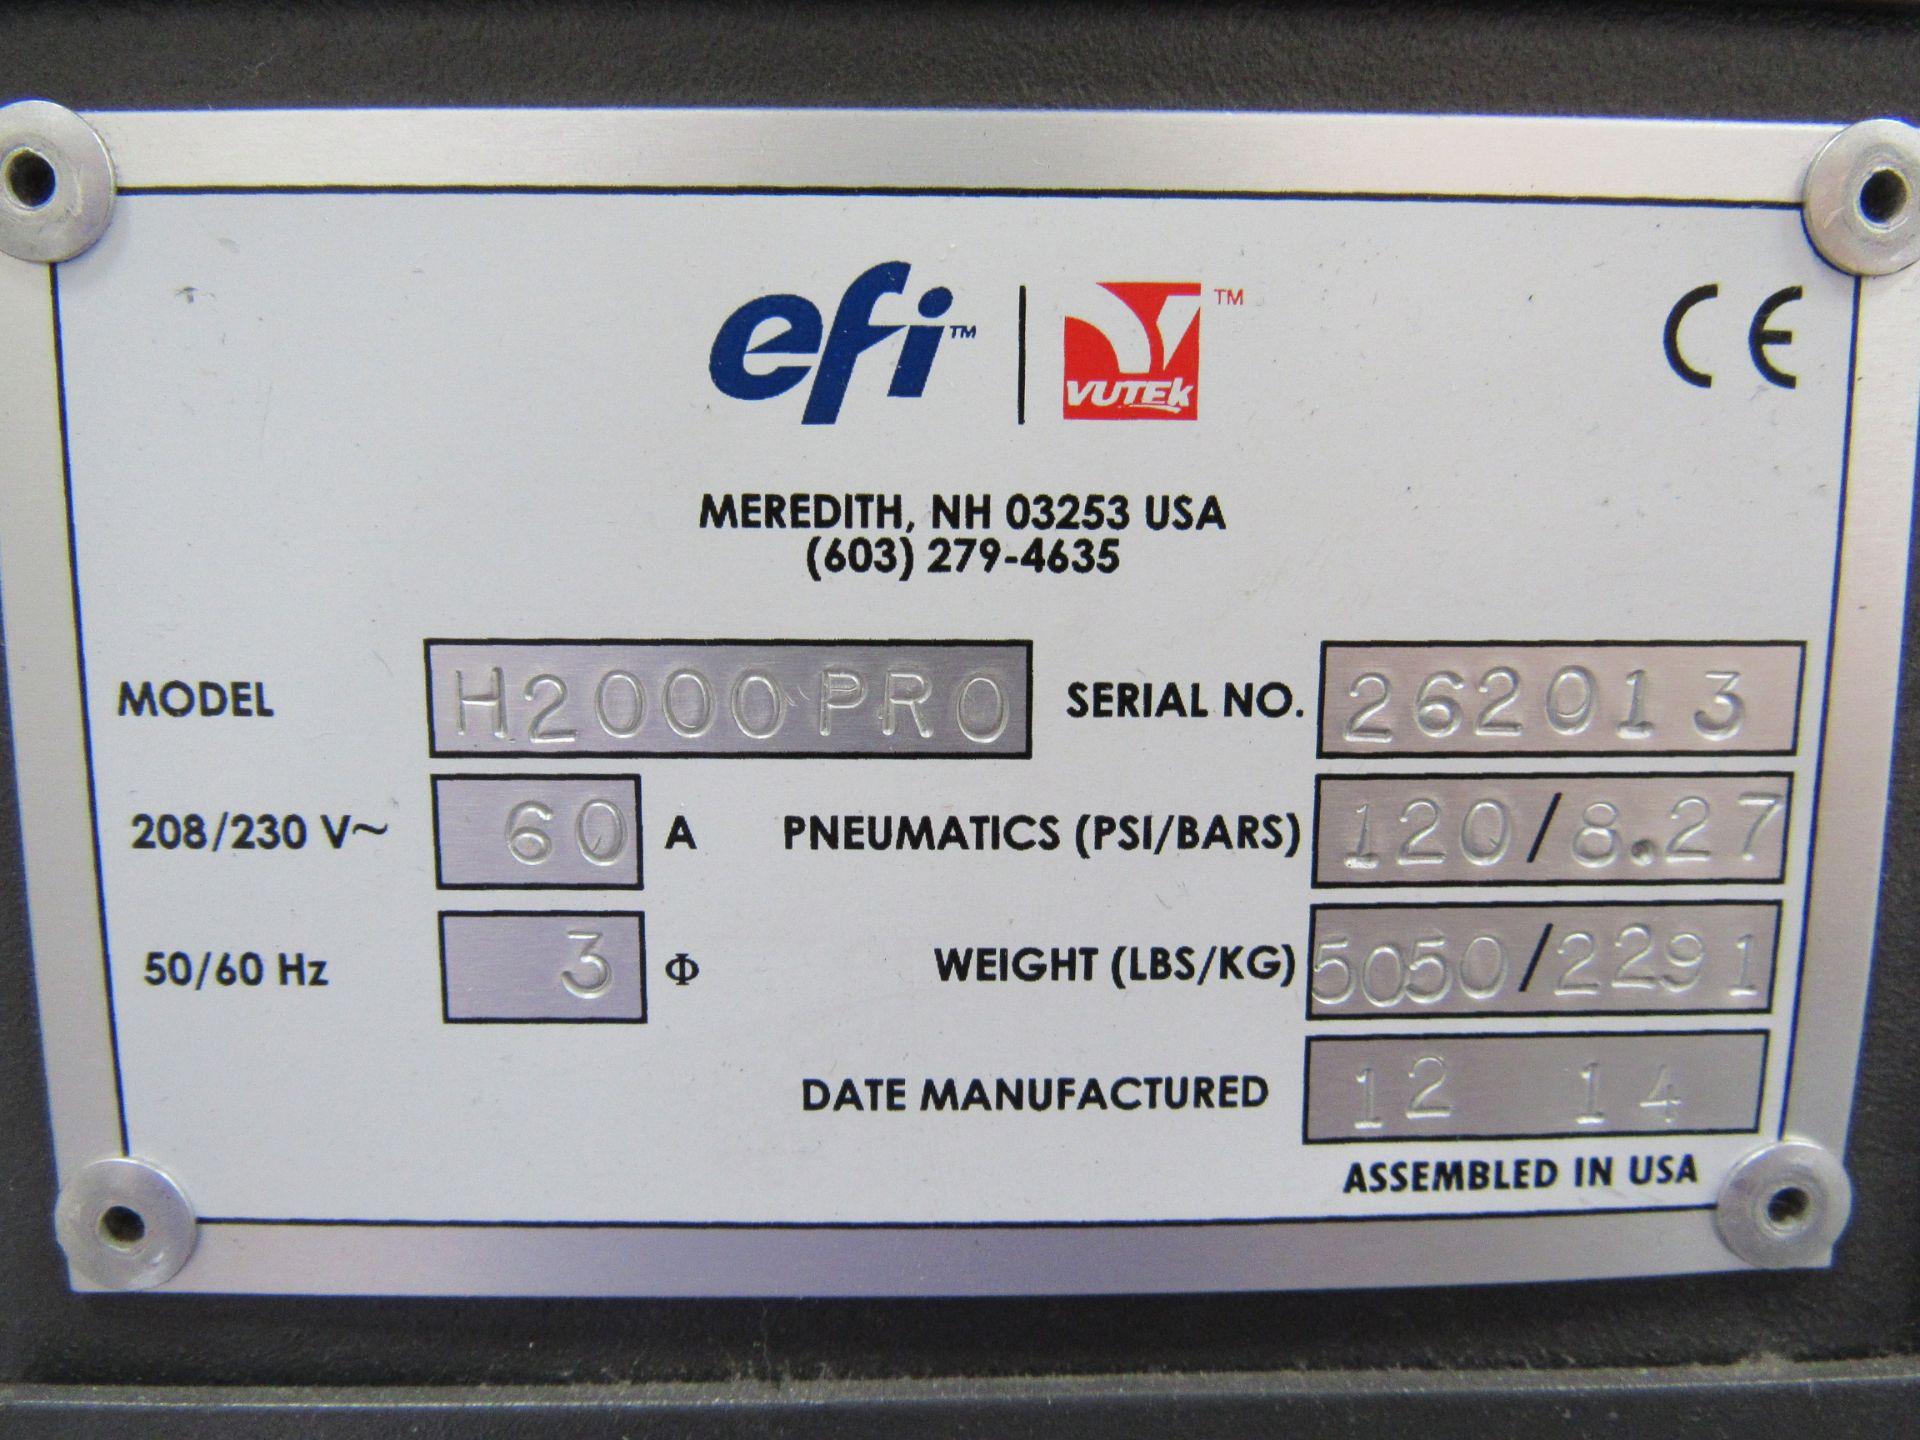 EFI VUTEk H2000 Pro - UltraDrop Technology UV 2m Hybrid Printer, Serial Number 262013, Dec 2014, - Image 4 of 16